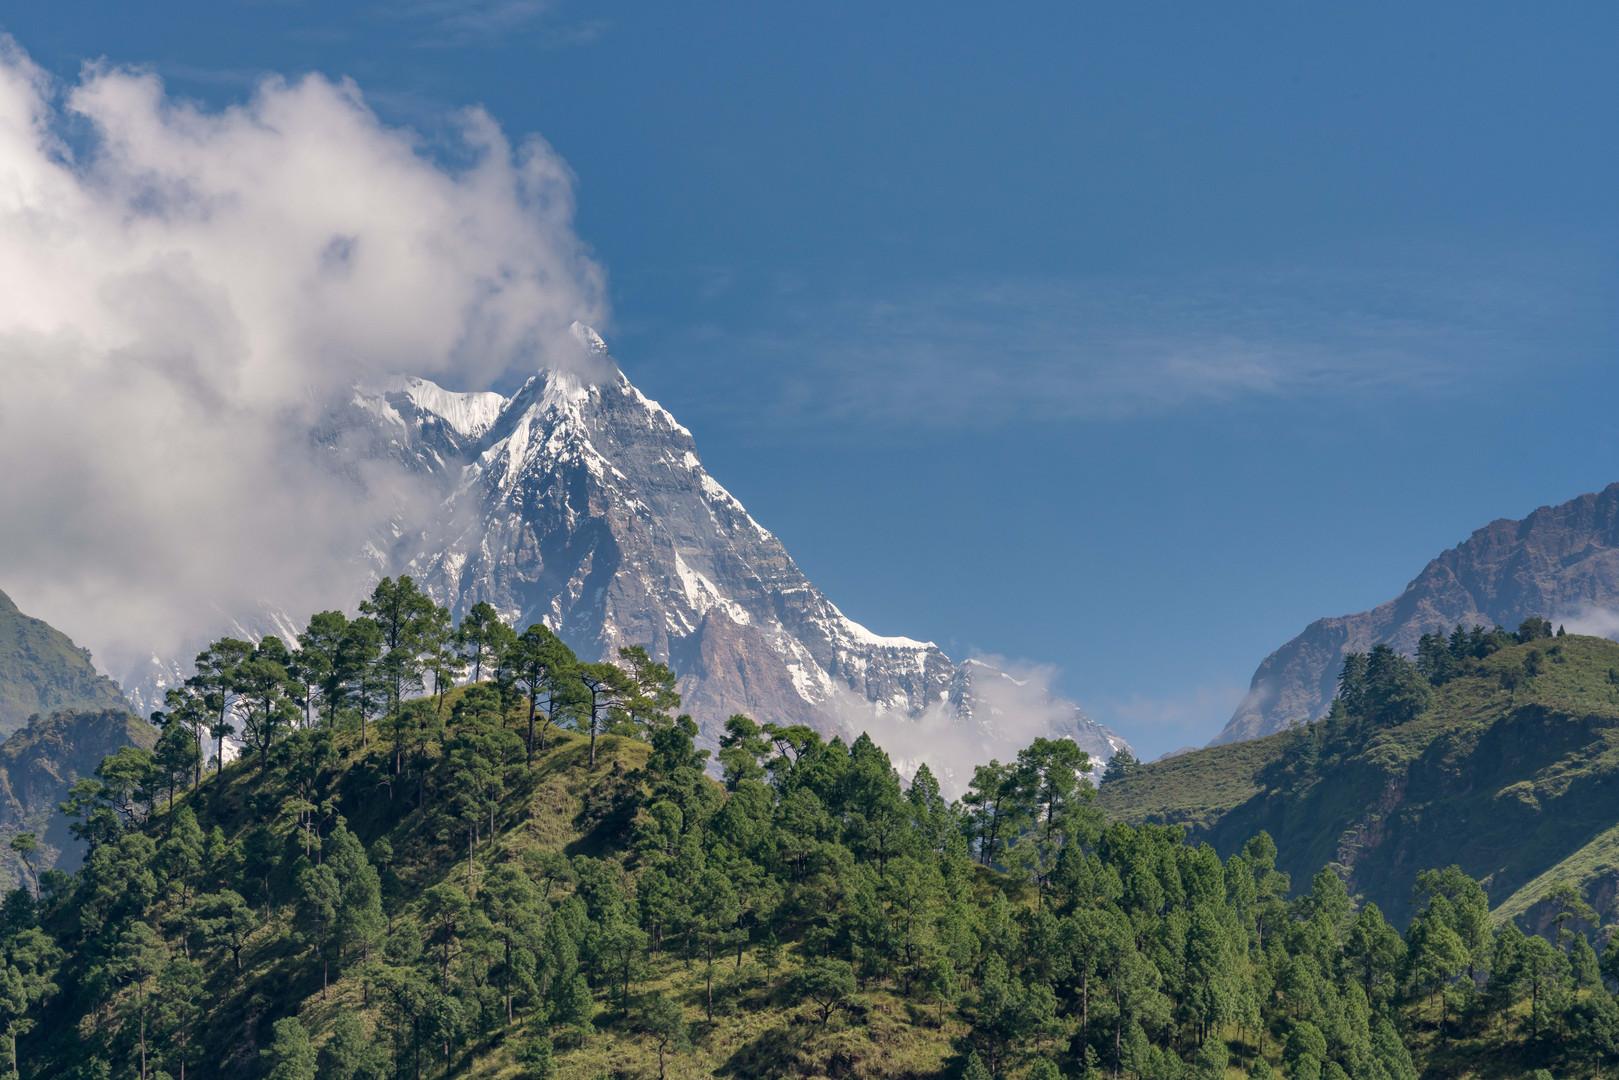 Western side of Annapurna